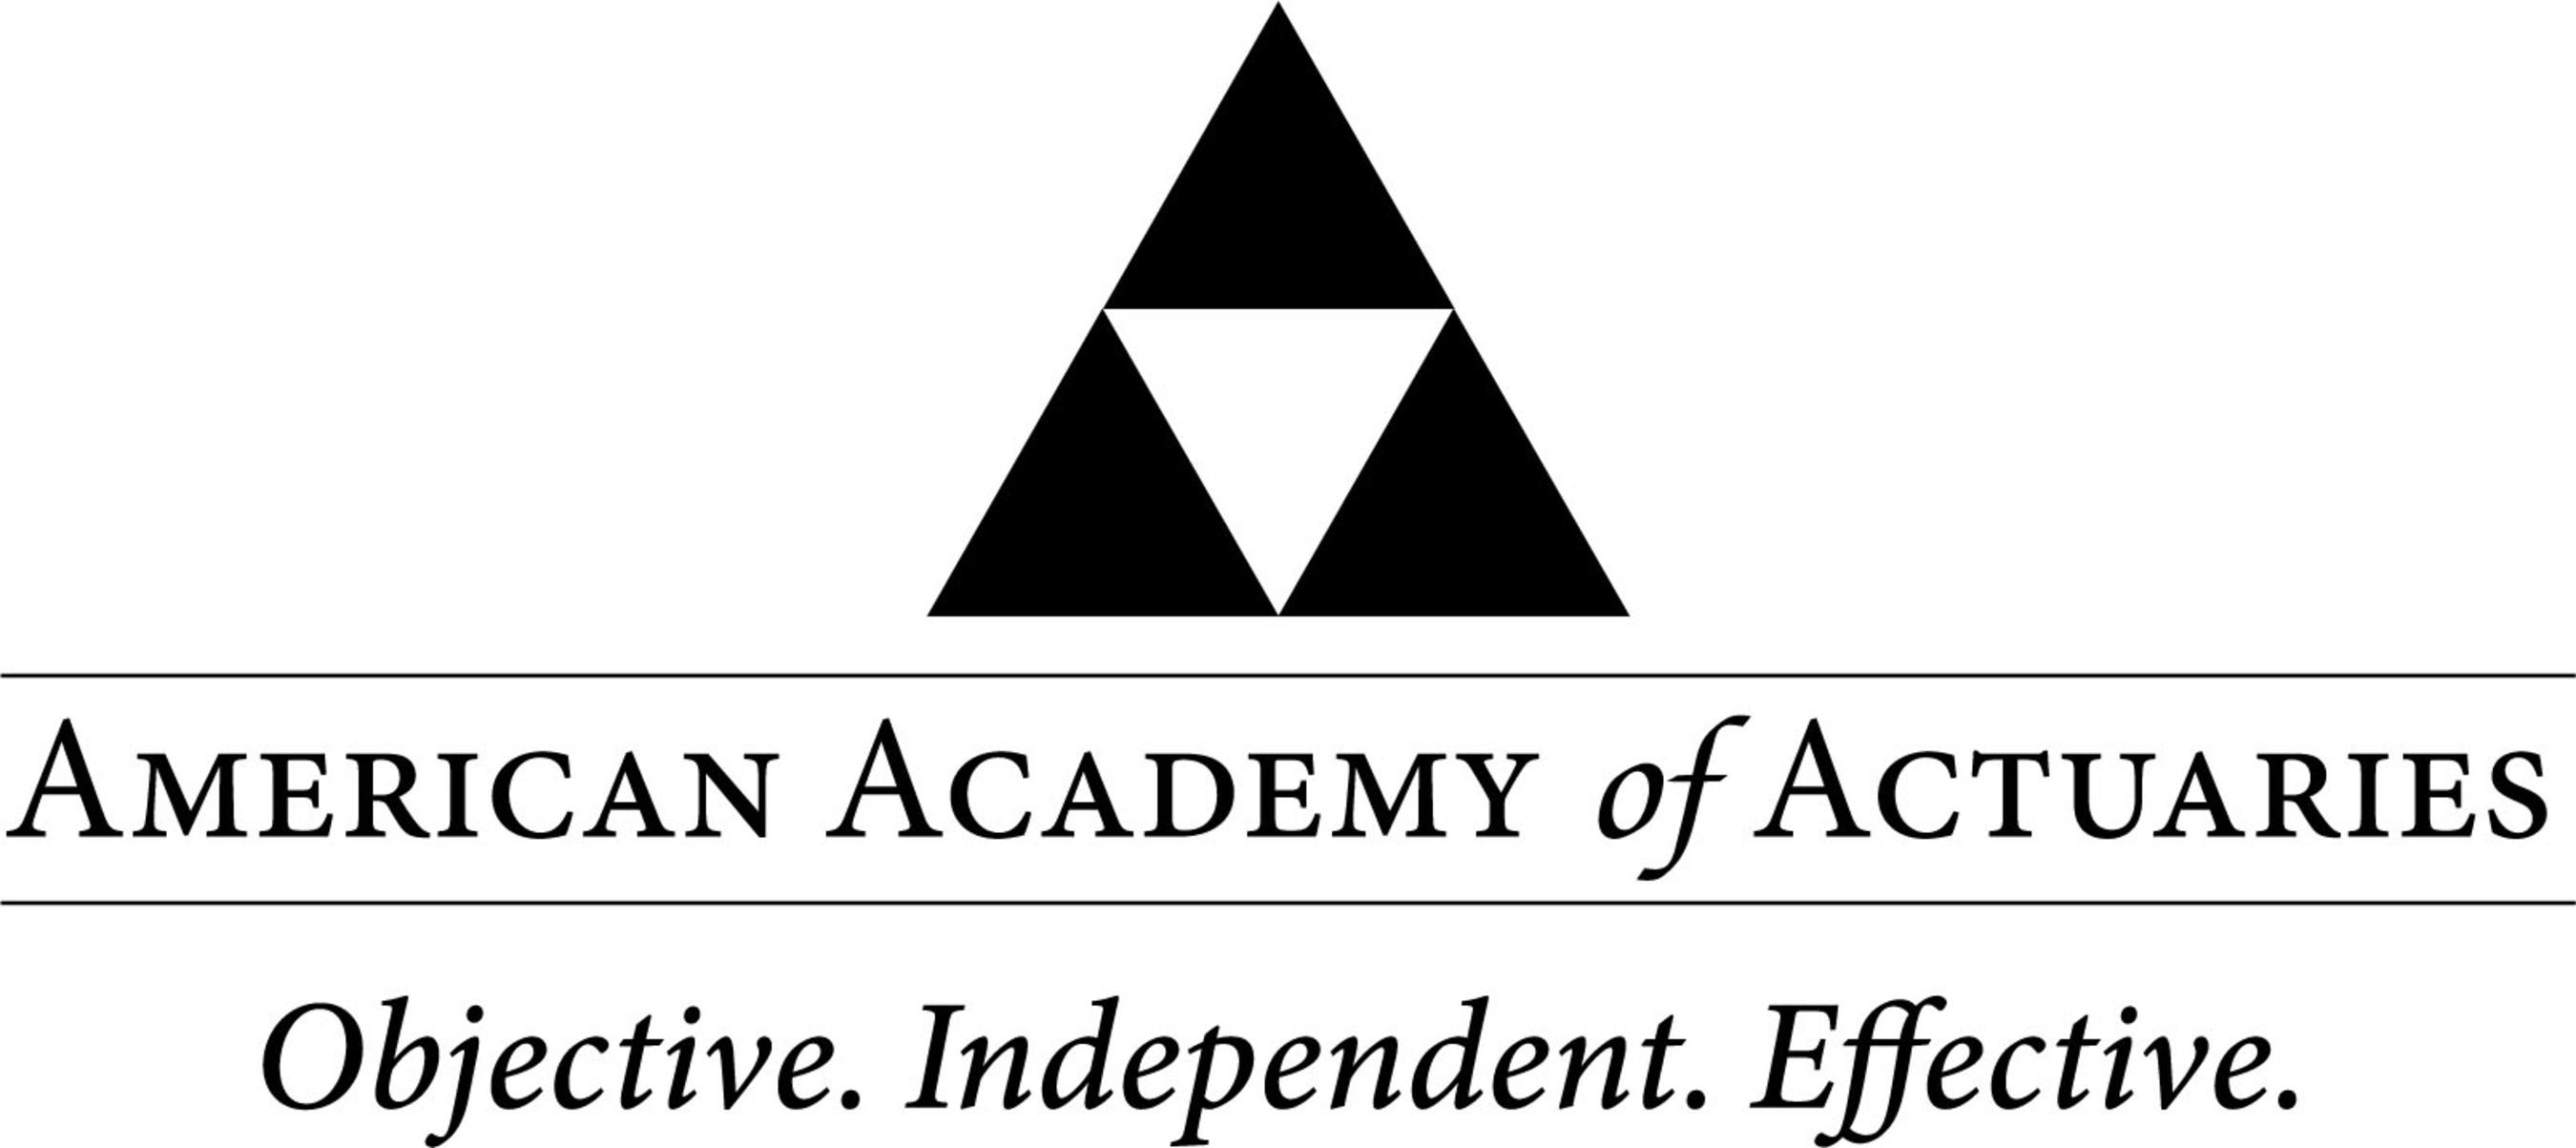 American Academy of Actuaries